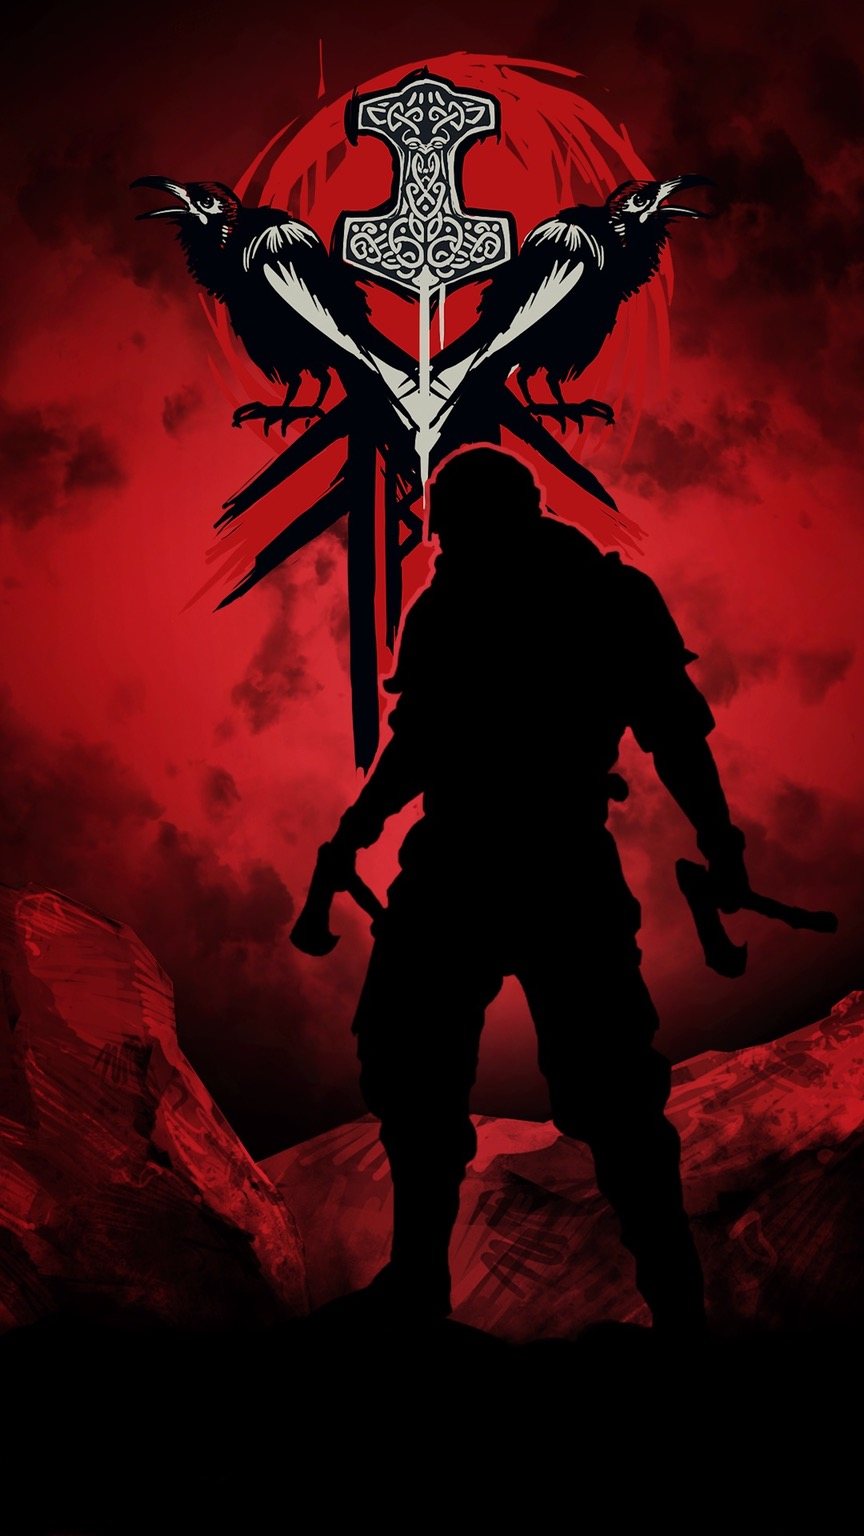 Berserk Mobile Wallpaper - Honor Viking , HD Wallpaper & Backgrounds